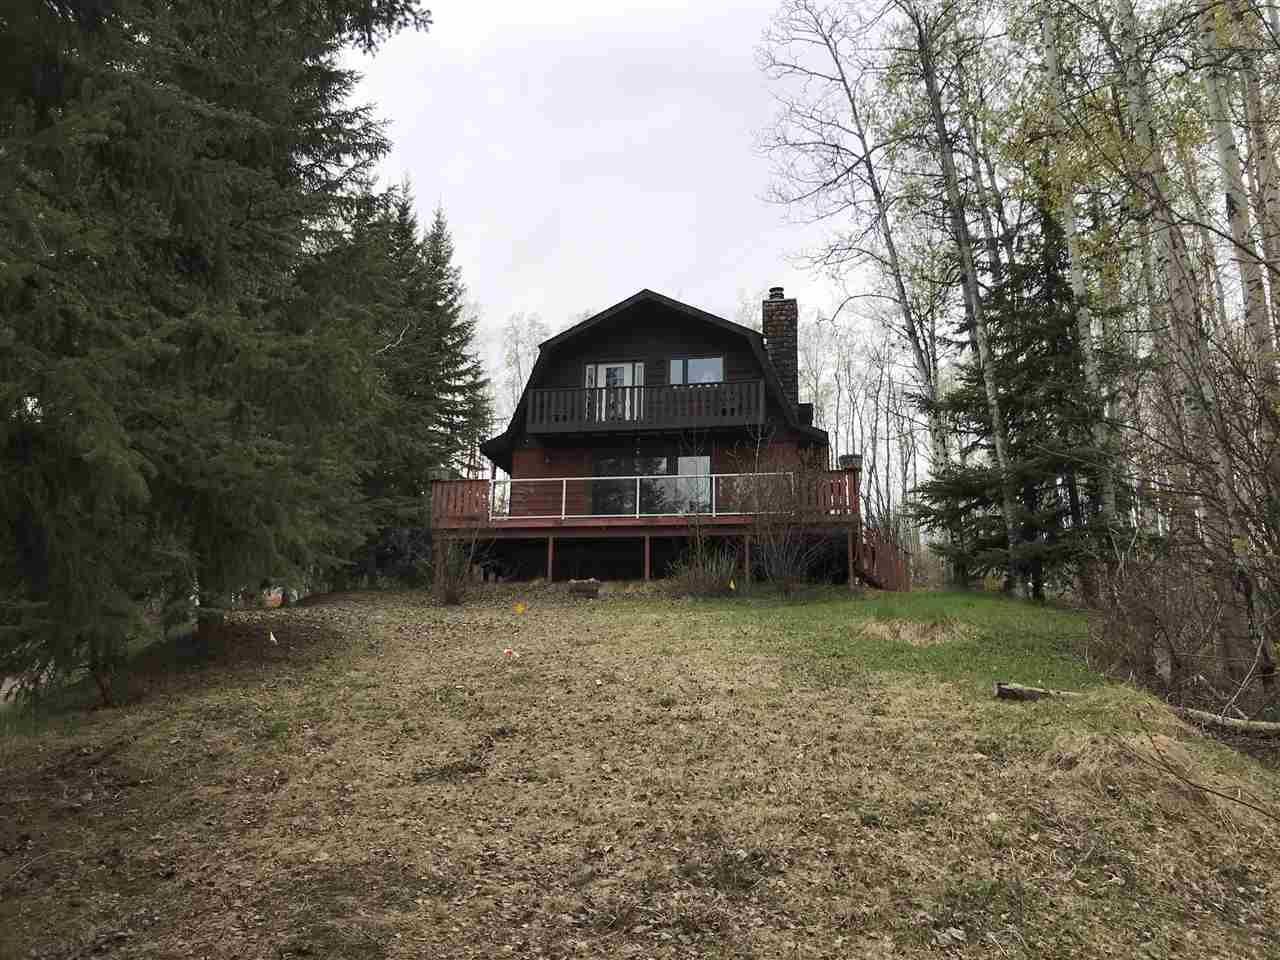 Main Photo: 13210 CHARLIE LAKE Crescent: Charlie Lake House for sale (Fort St. John (Zone 60))  : MLS®# R2457551